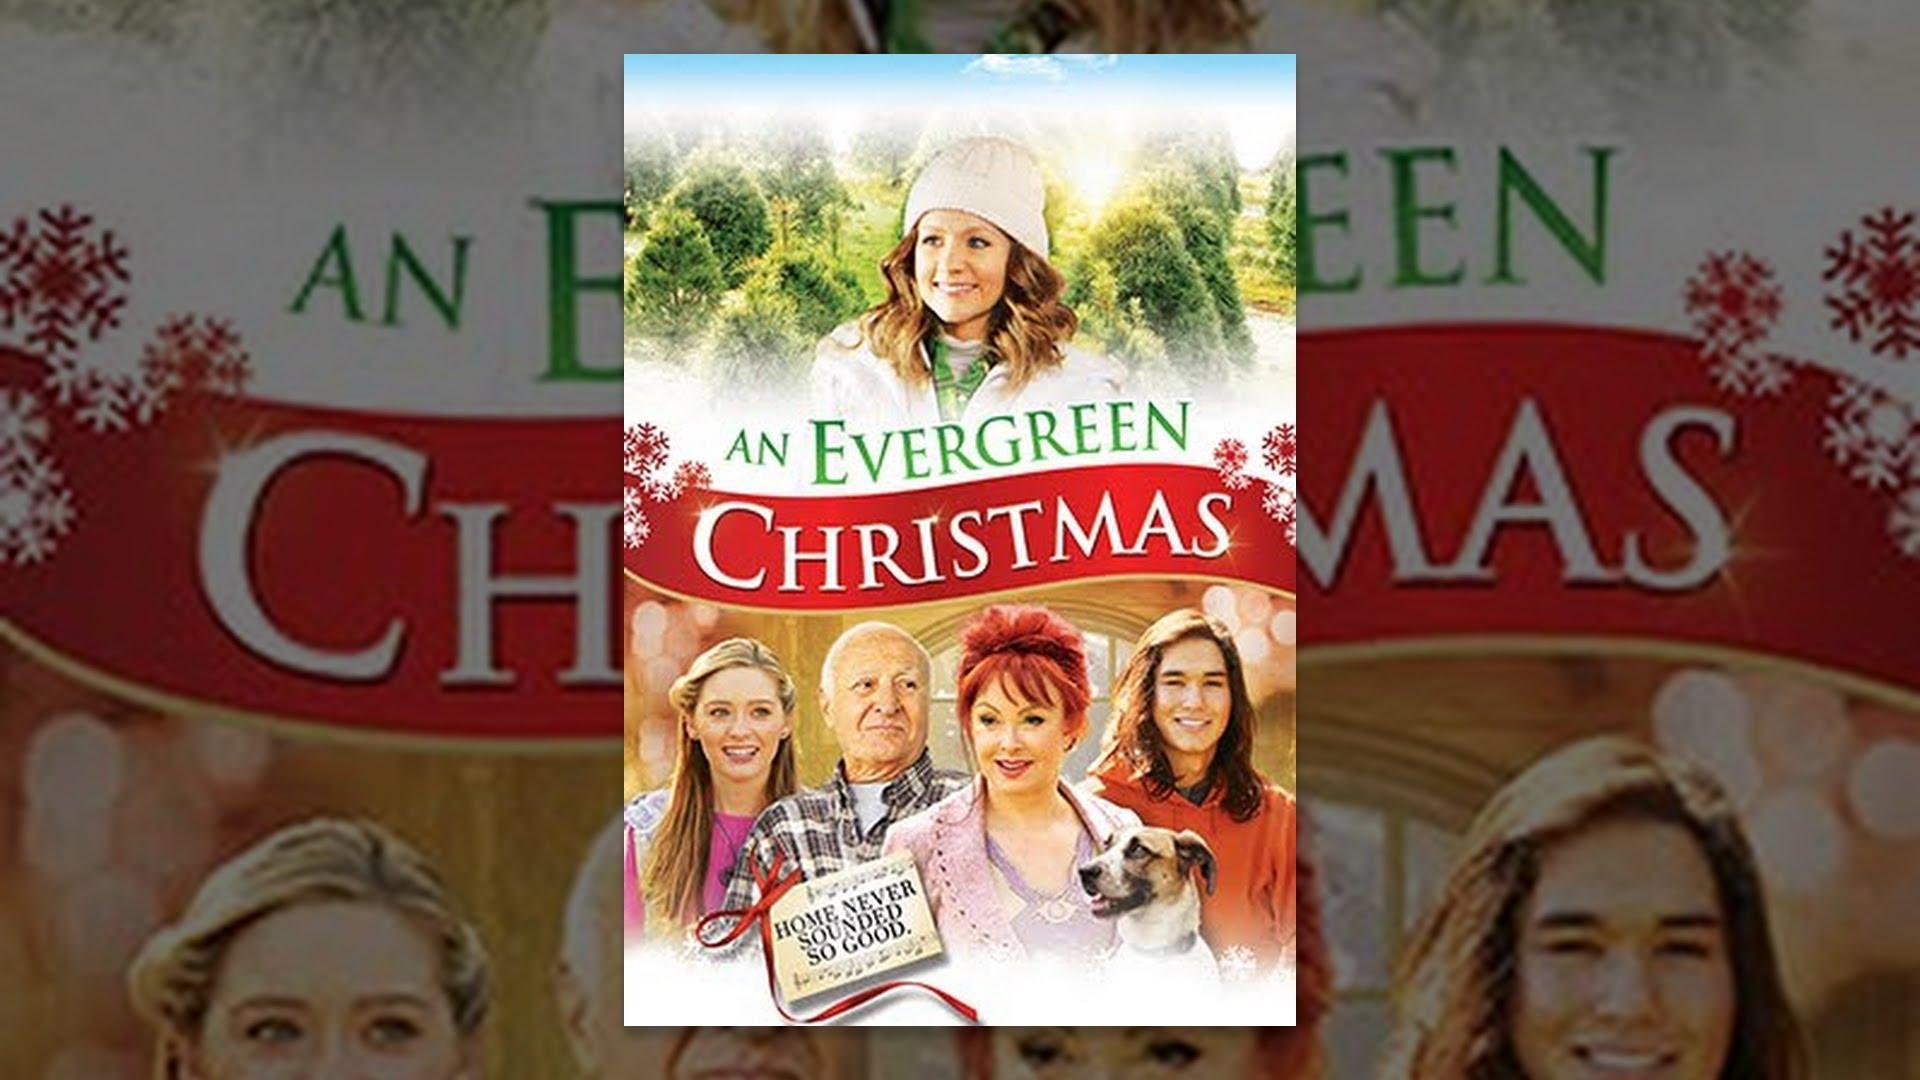 an evergreen christmas - An Evergreen Christmas